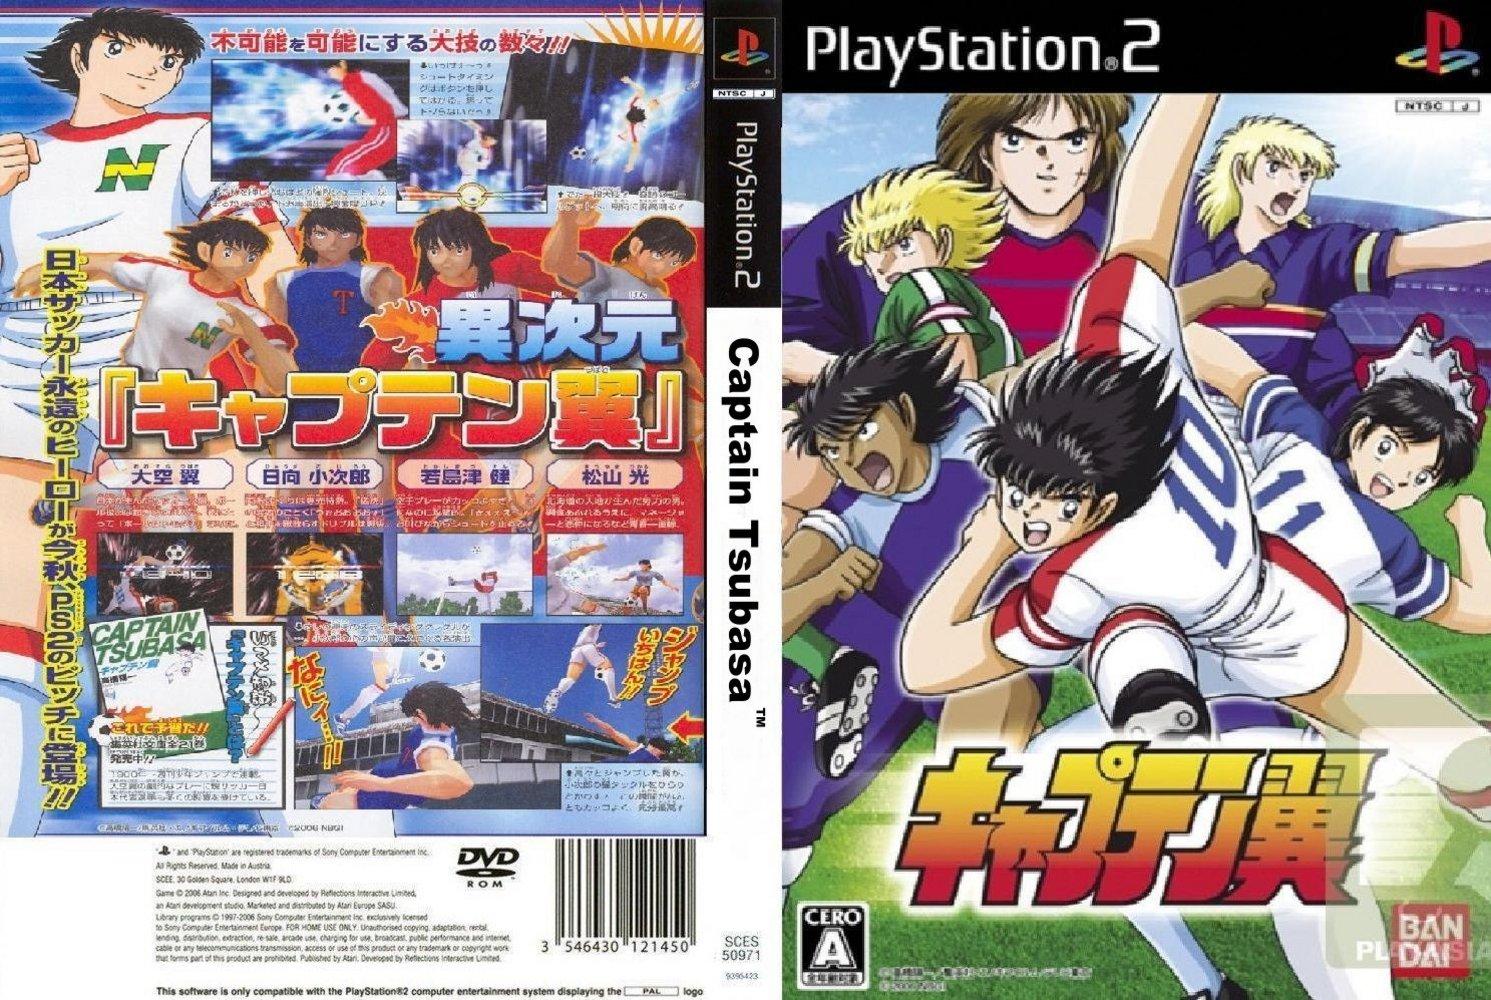 Download Game Tsubasa Pc Ps2